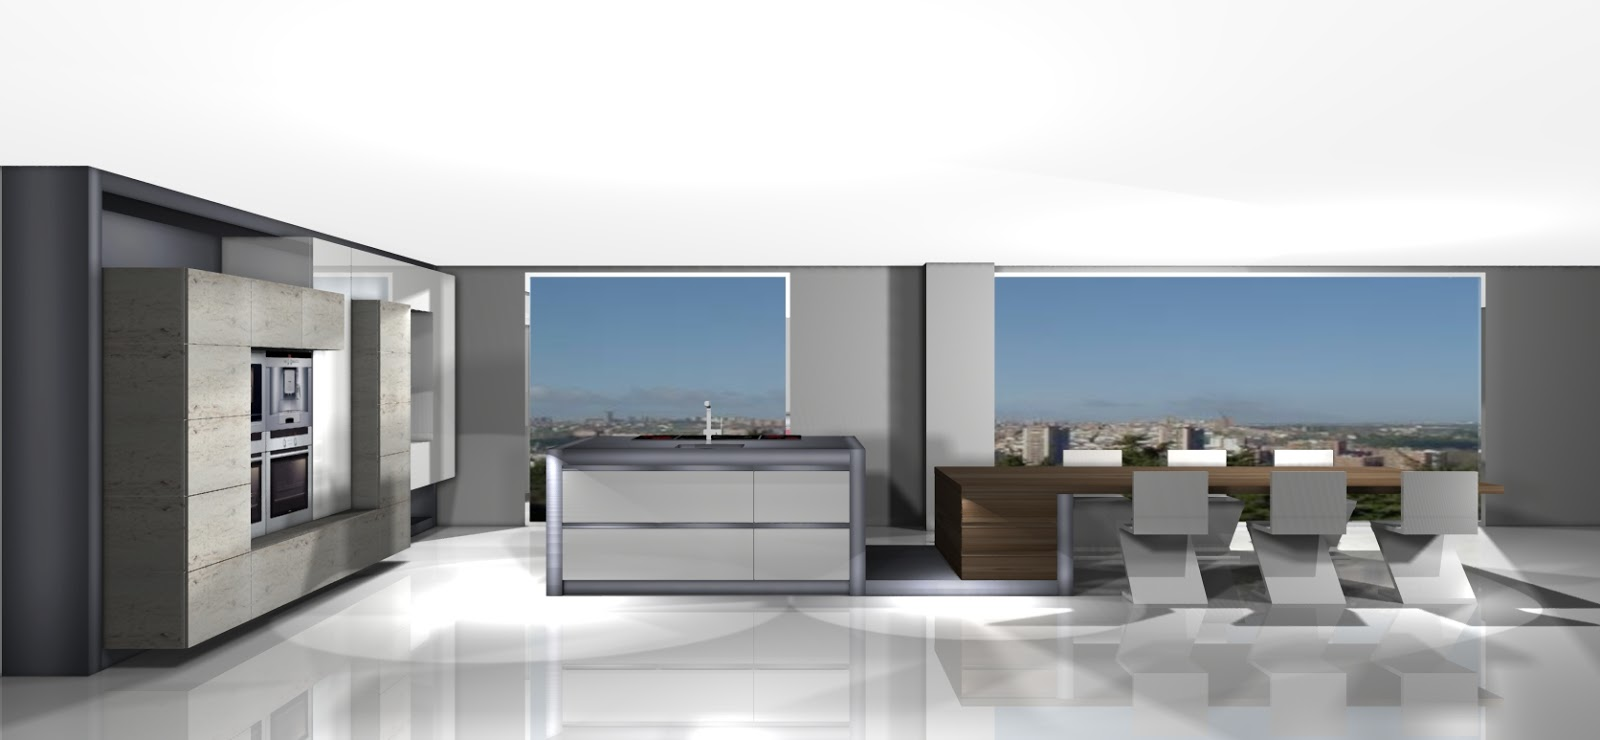 Centro kitchenmaster madrid 3d thempo con kitchenmaster for Software diseno de cocinas